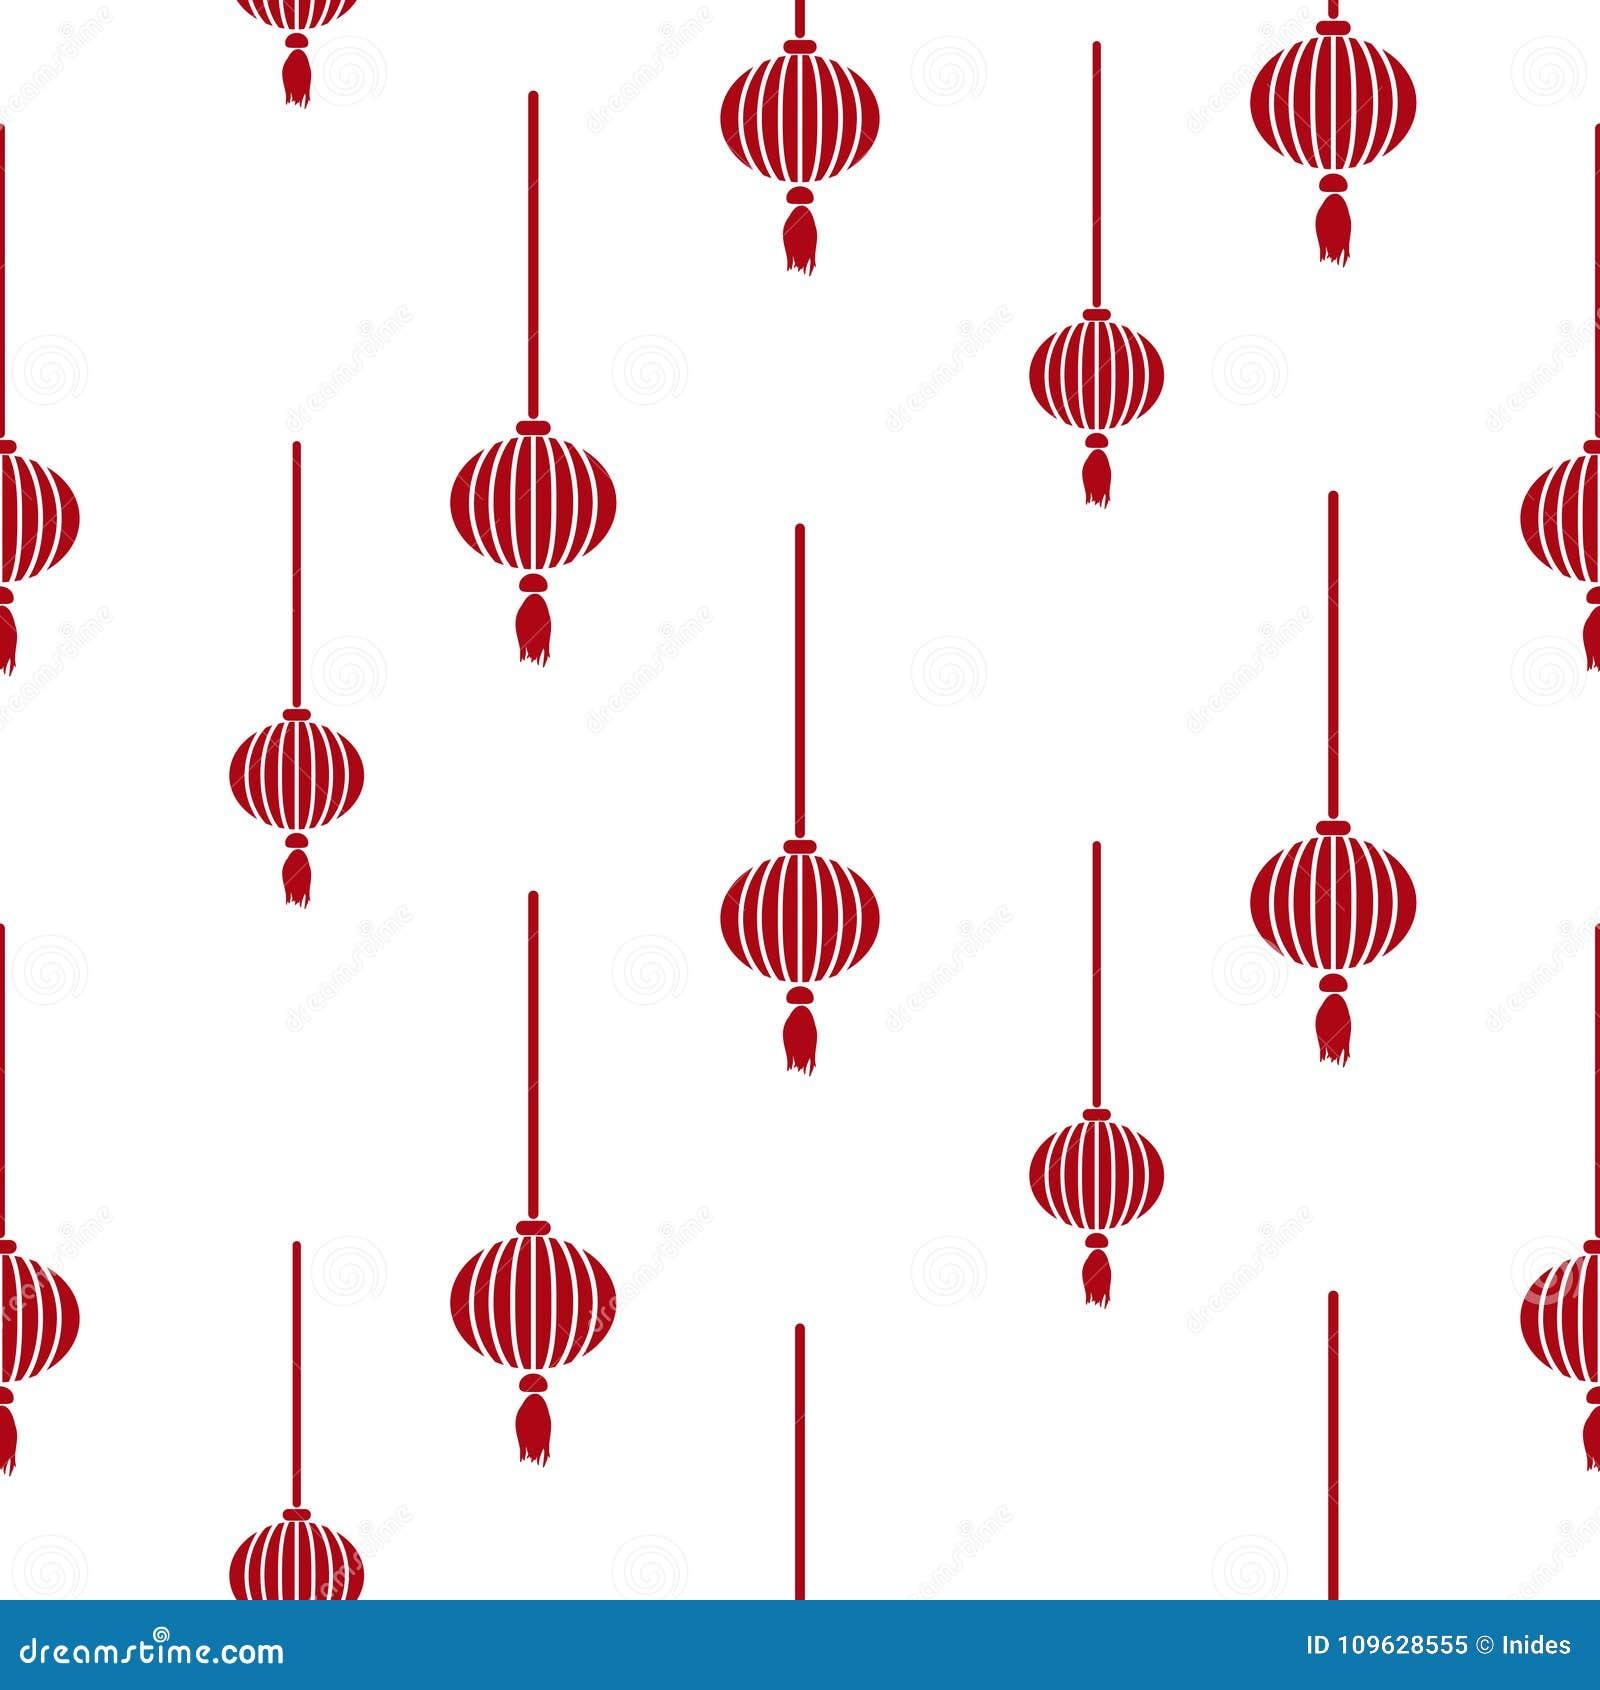 Chinese Lantern Simple Seamless Vector Pattern. Stock ...